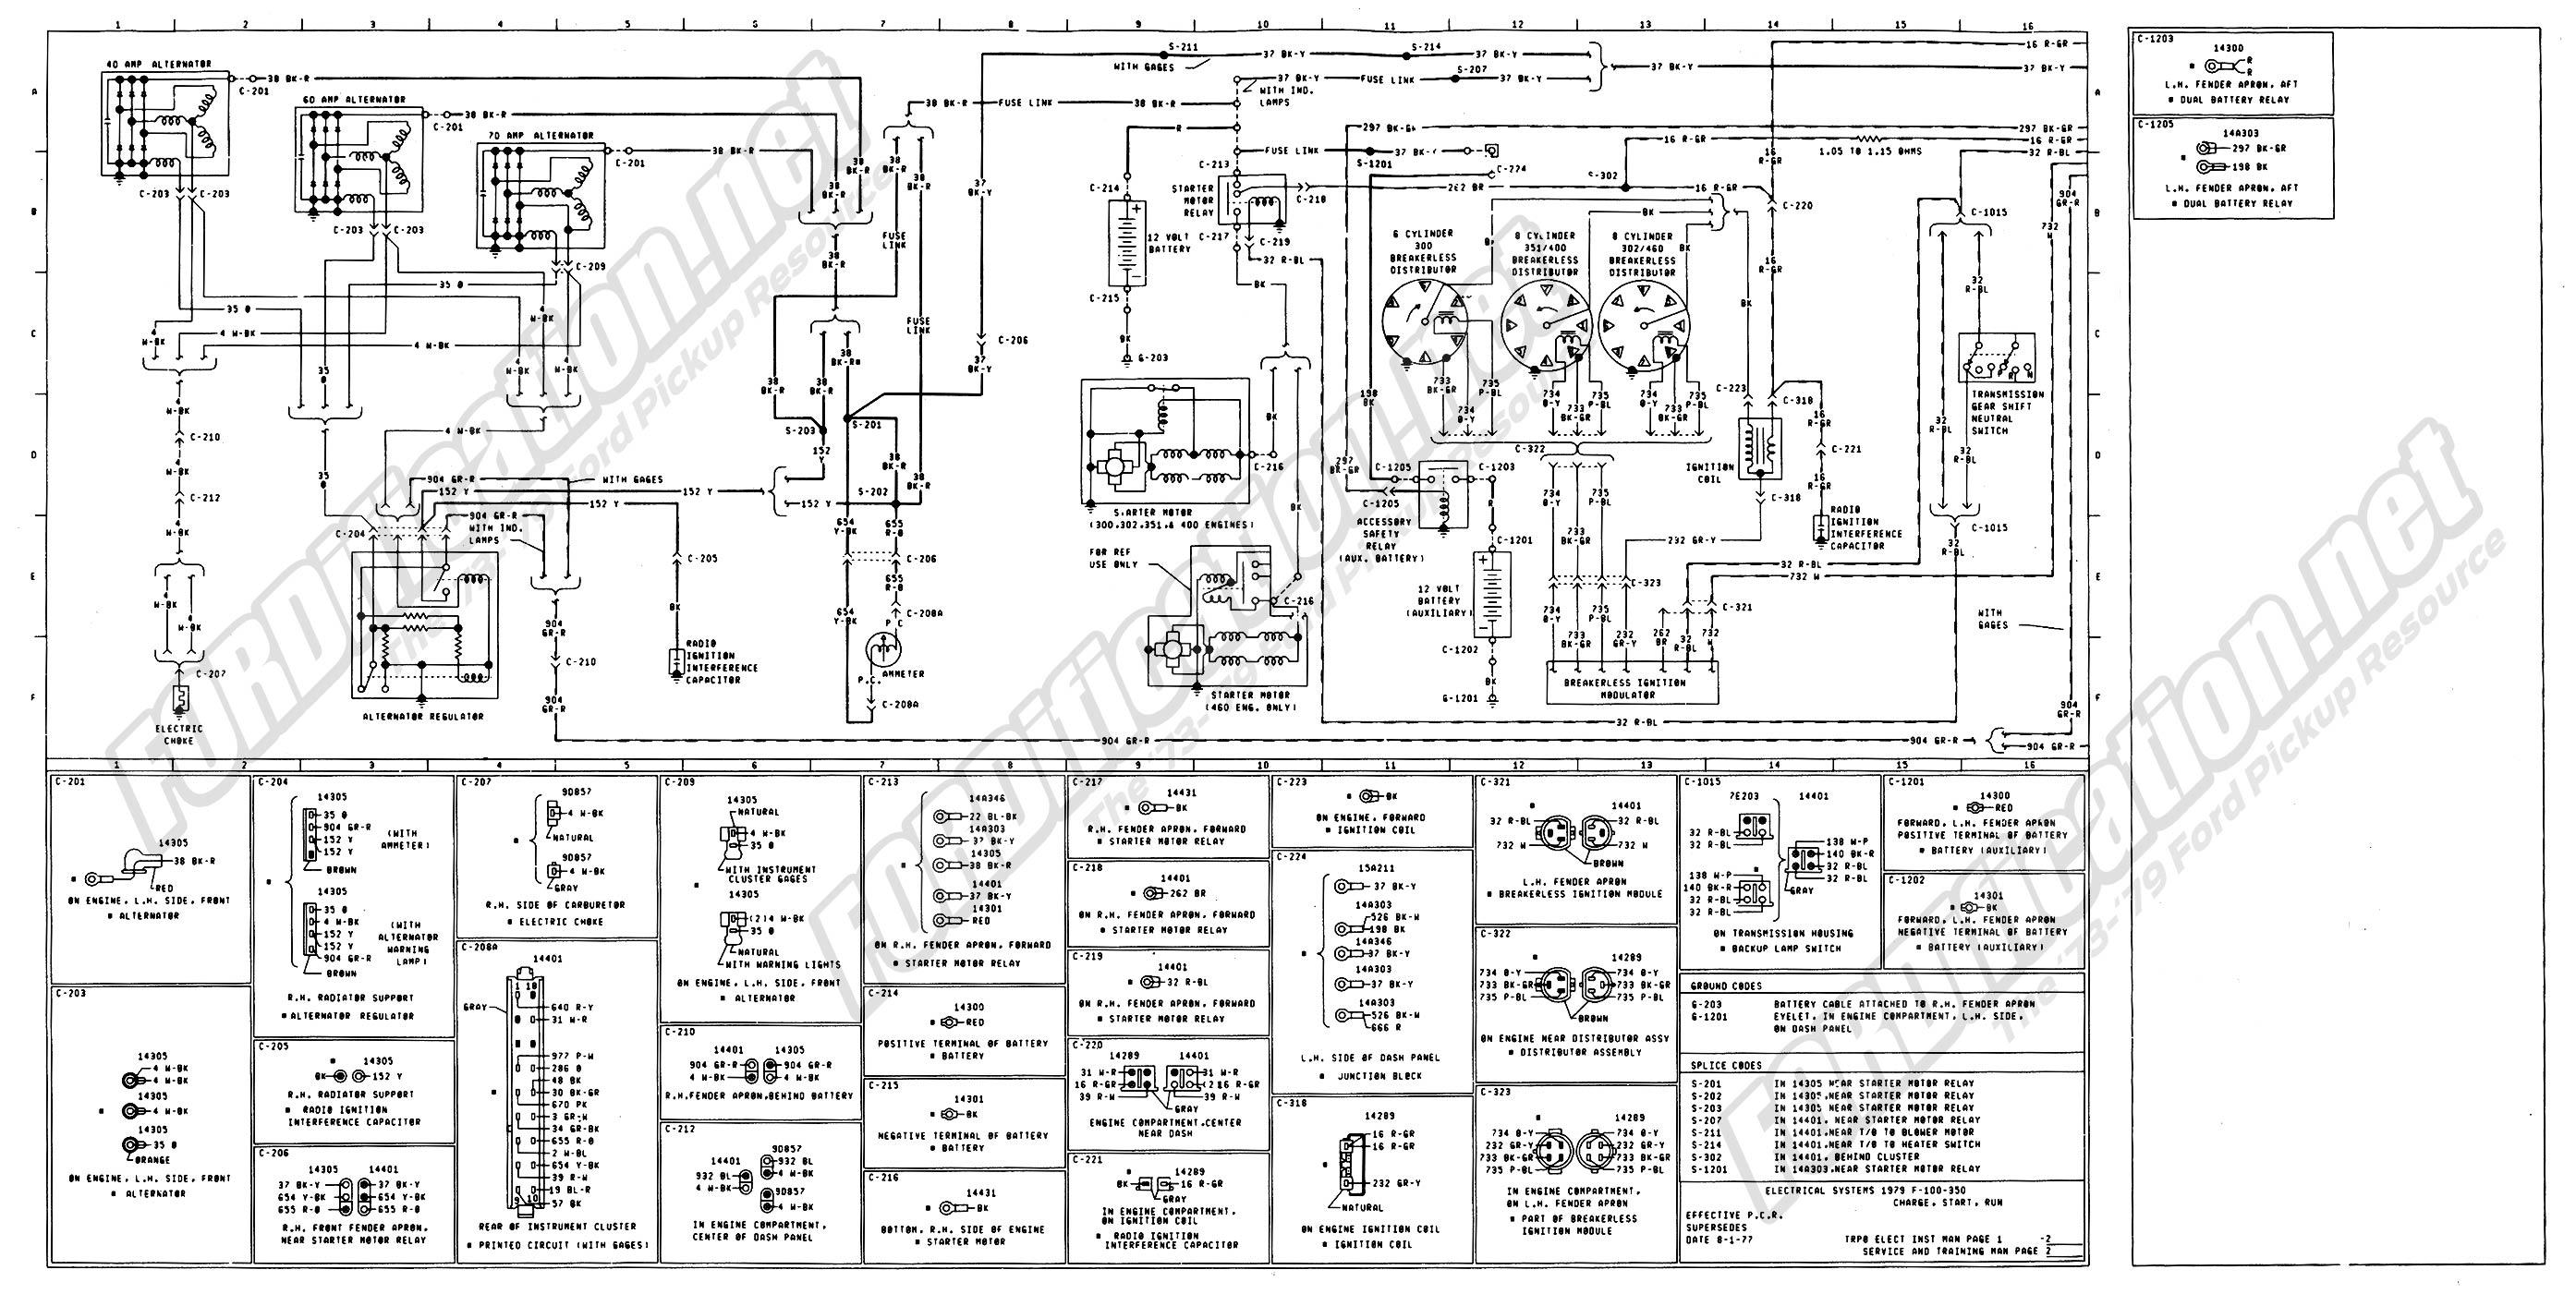 1978 ford Truck Wiring Schematic | Free Wiring Diagram